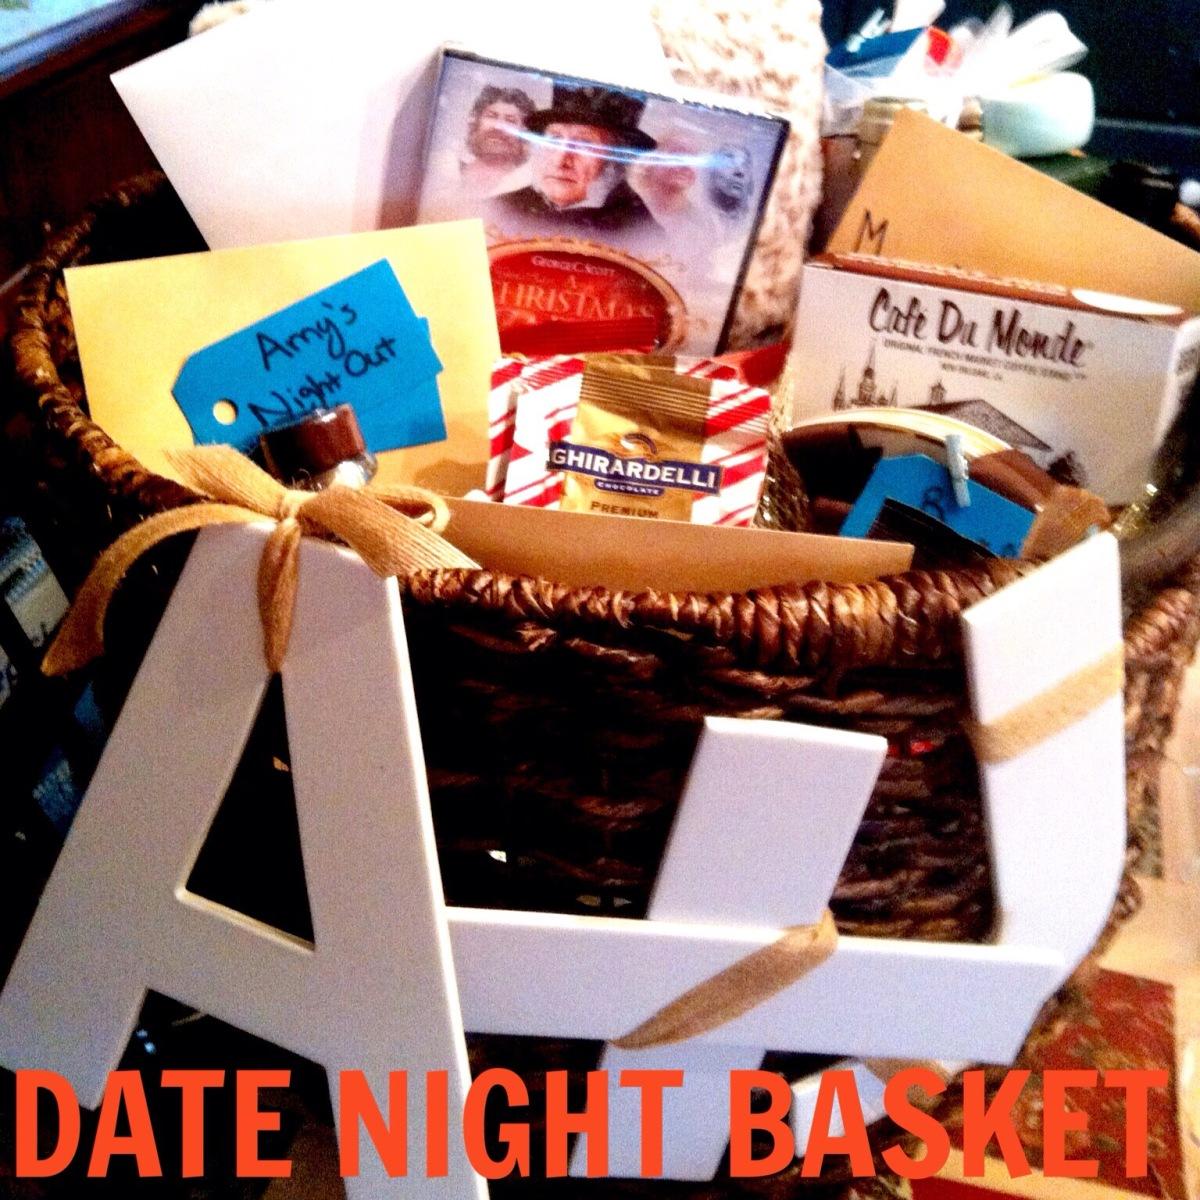 Date Night Wedding Gift Basket : Date Night Basket Classy on the Rocks